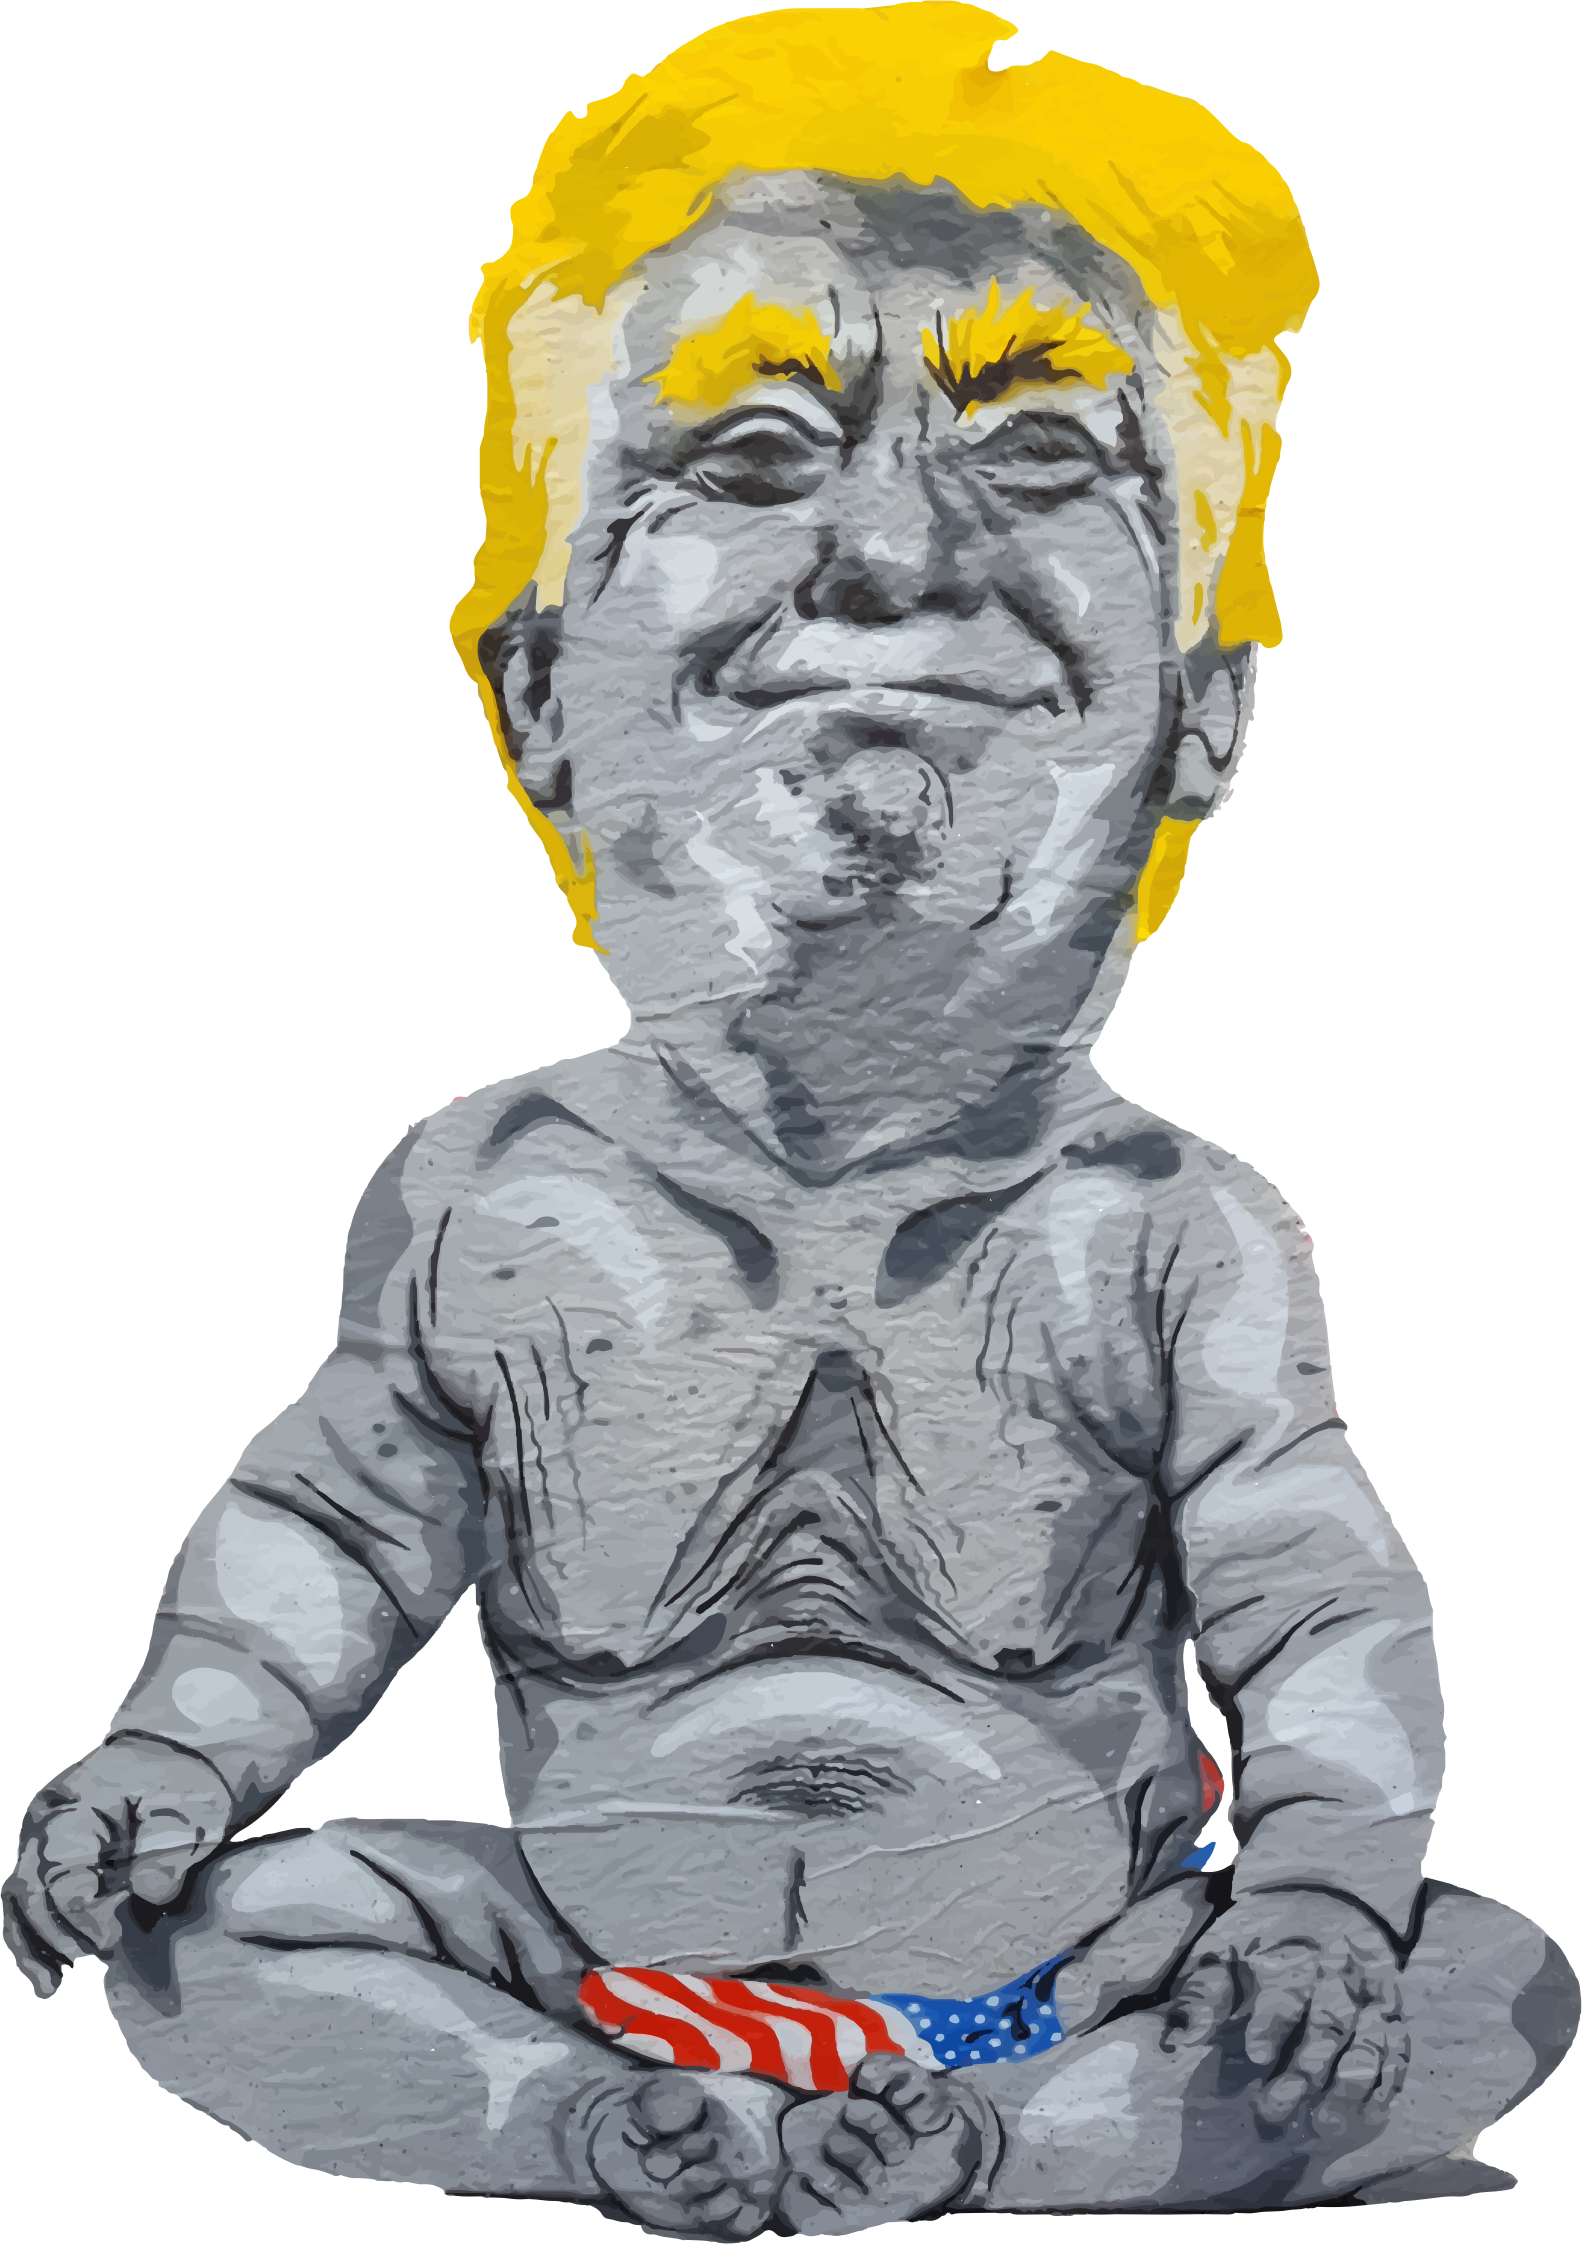 Trump big image png. Graffiti clipart man